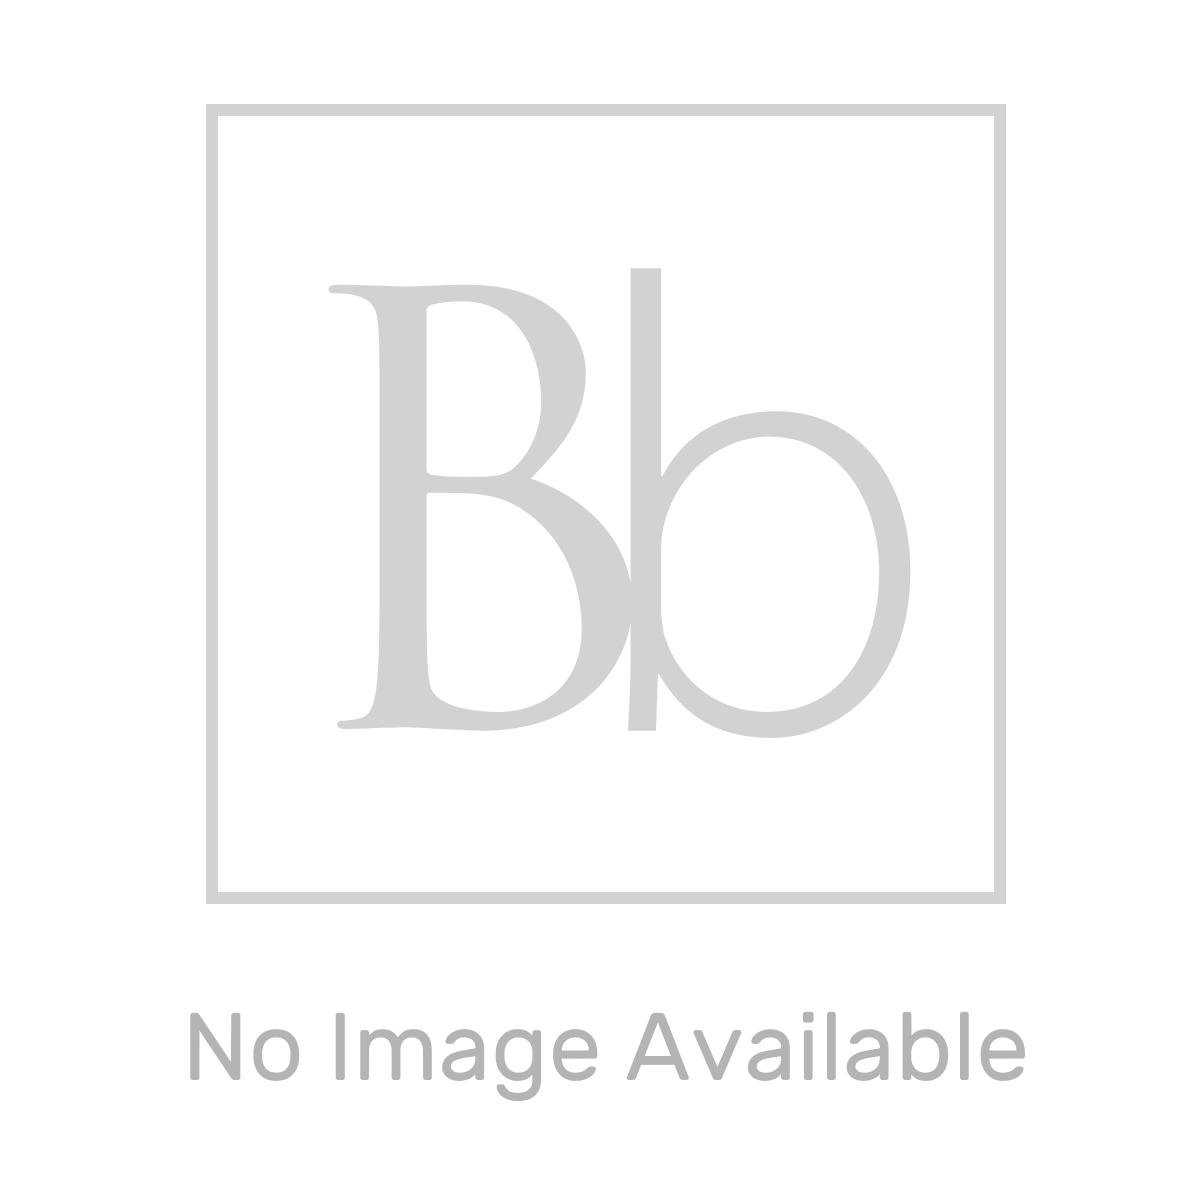 Austin Single Door Illuminated Bathroom Mirrored Cabinet Fixing Instructions